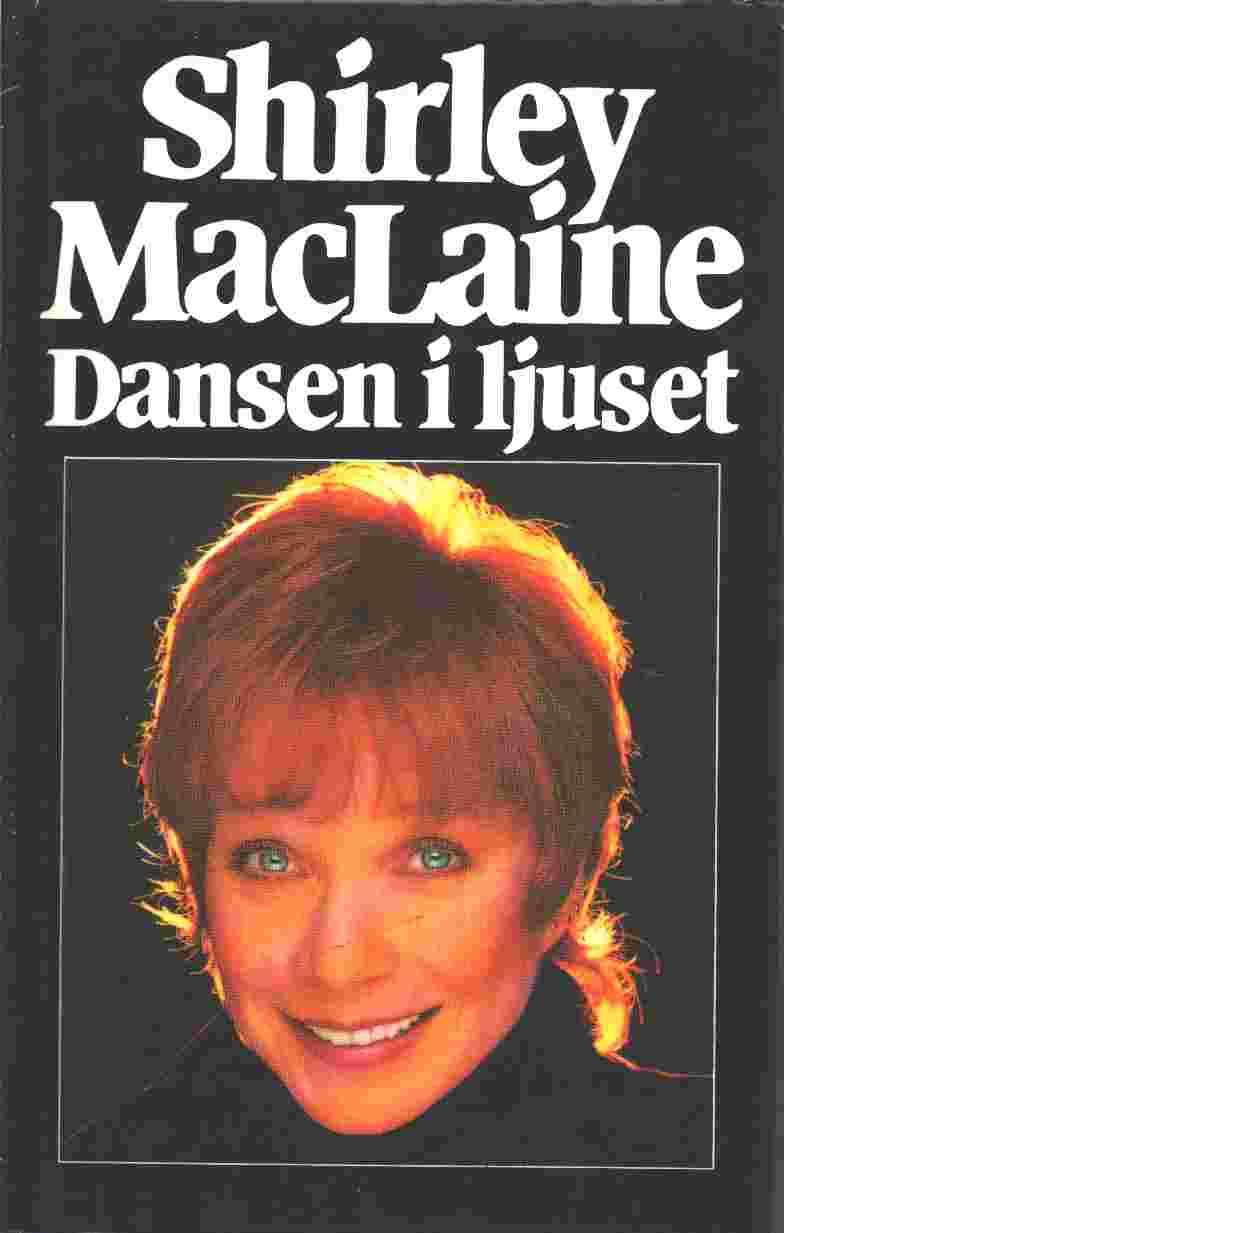 Dansen i ljuset - MacLaine, Shirley